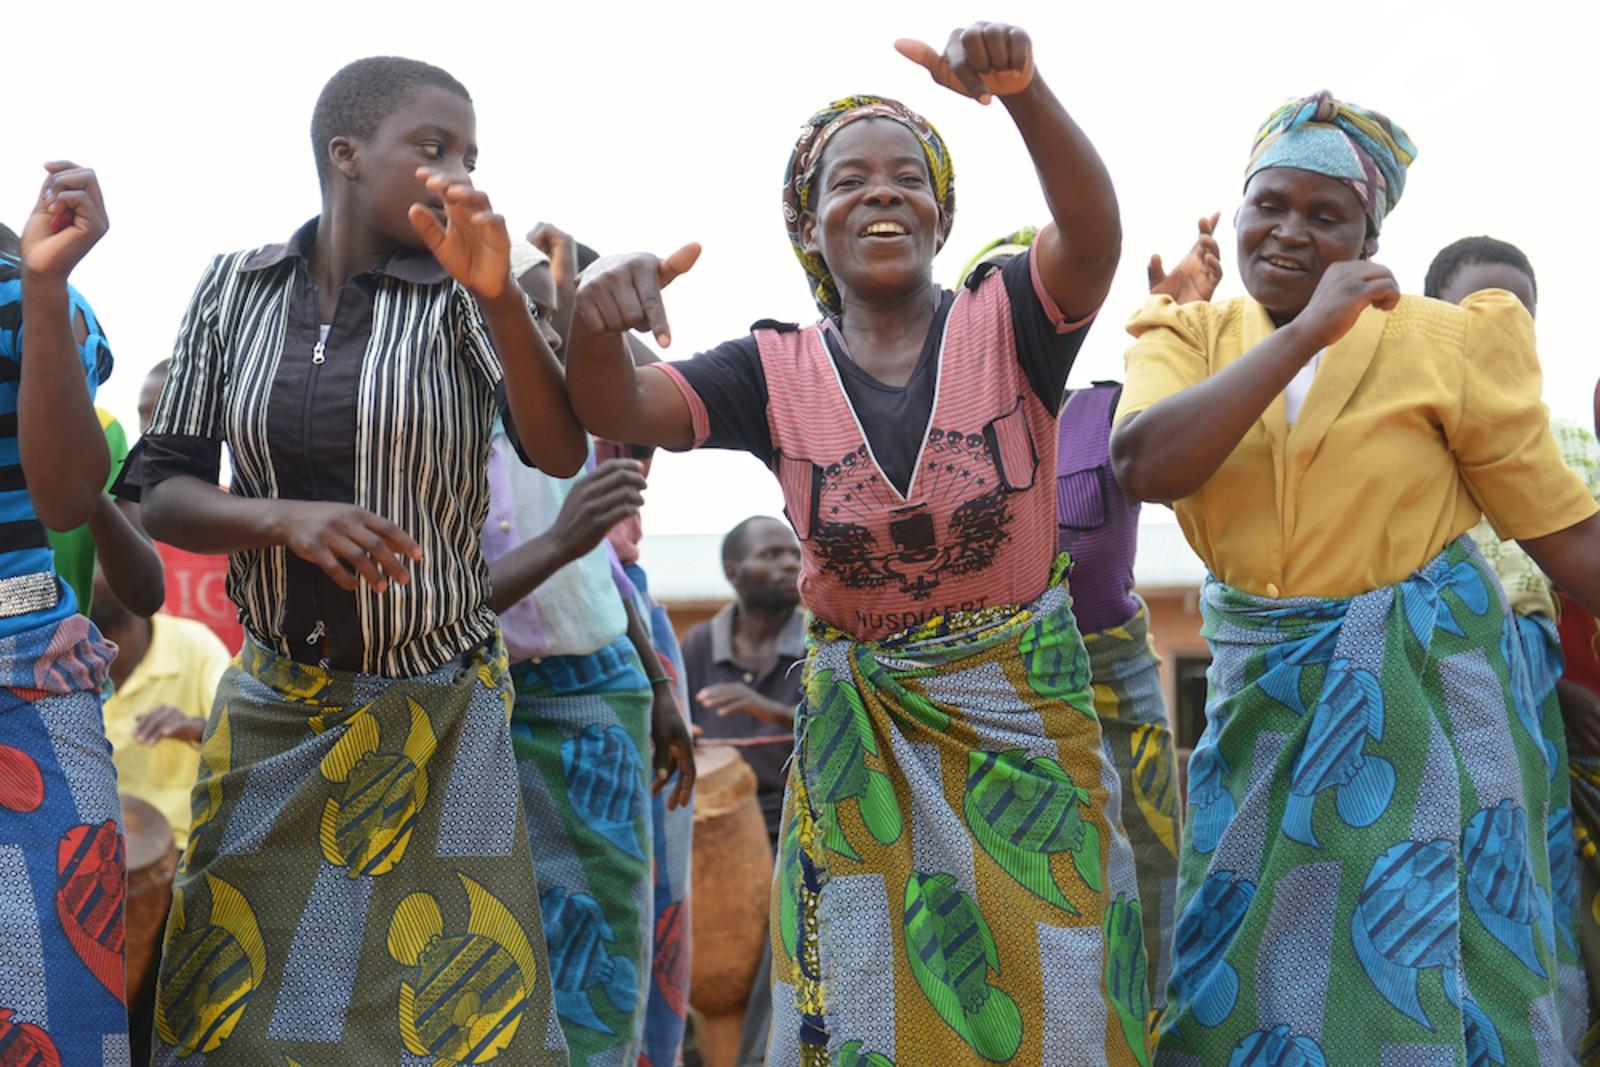 Local women dancing in malawi